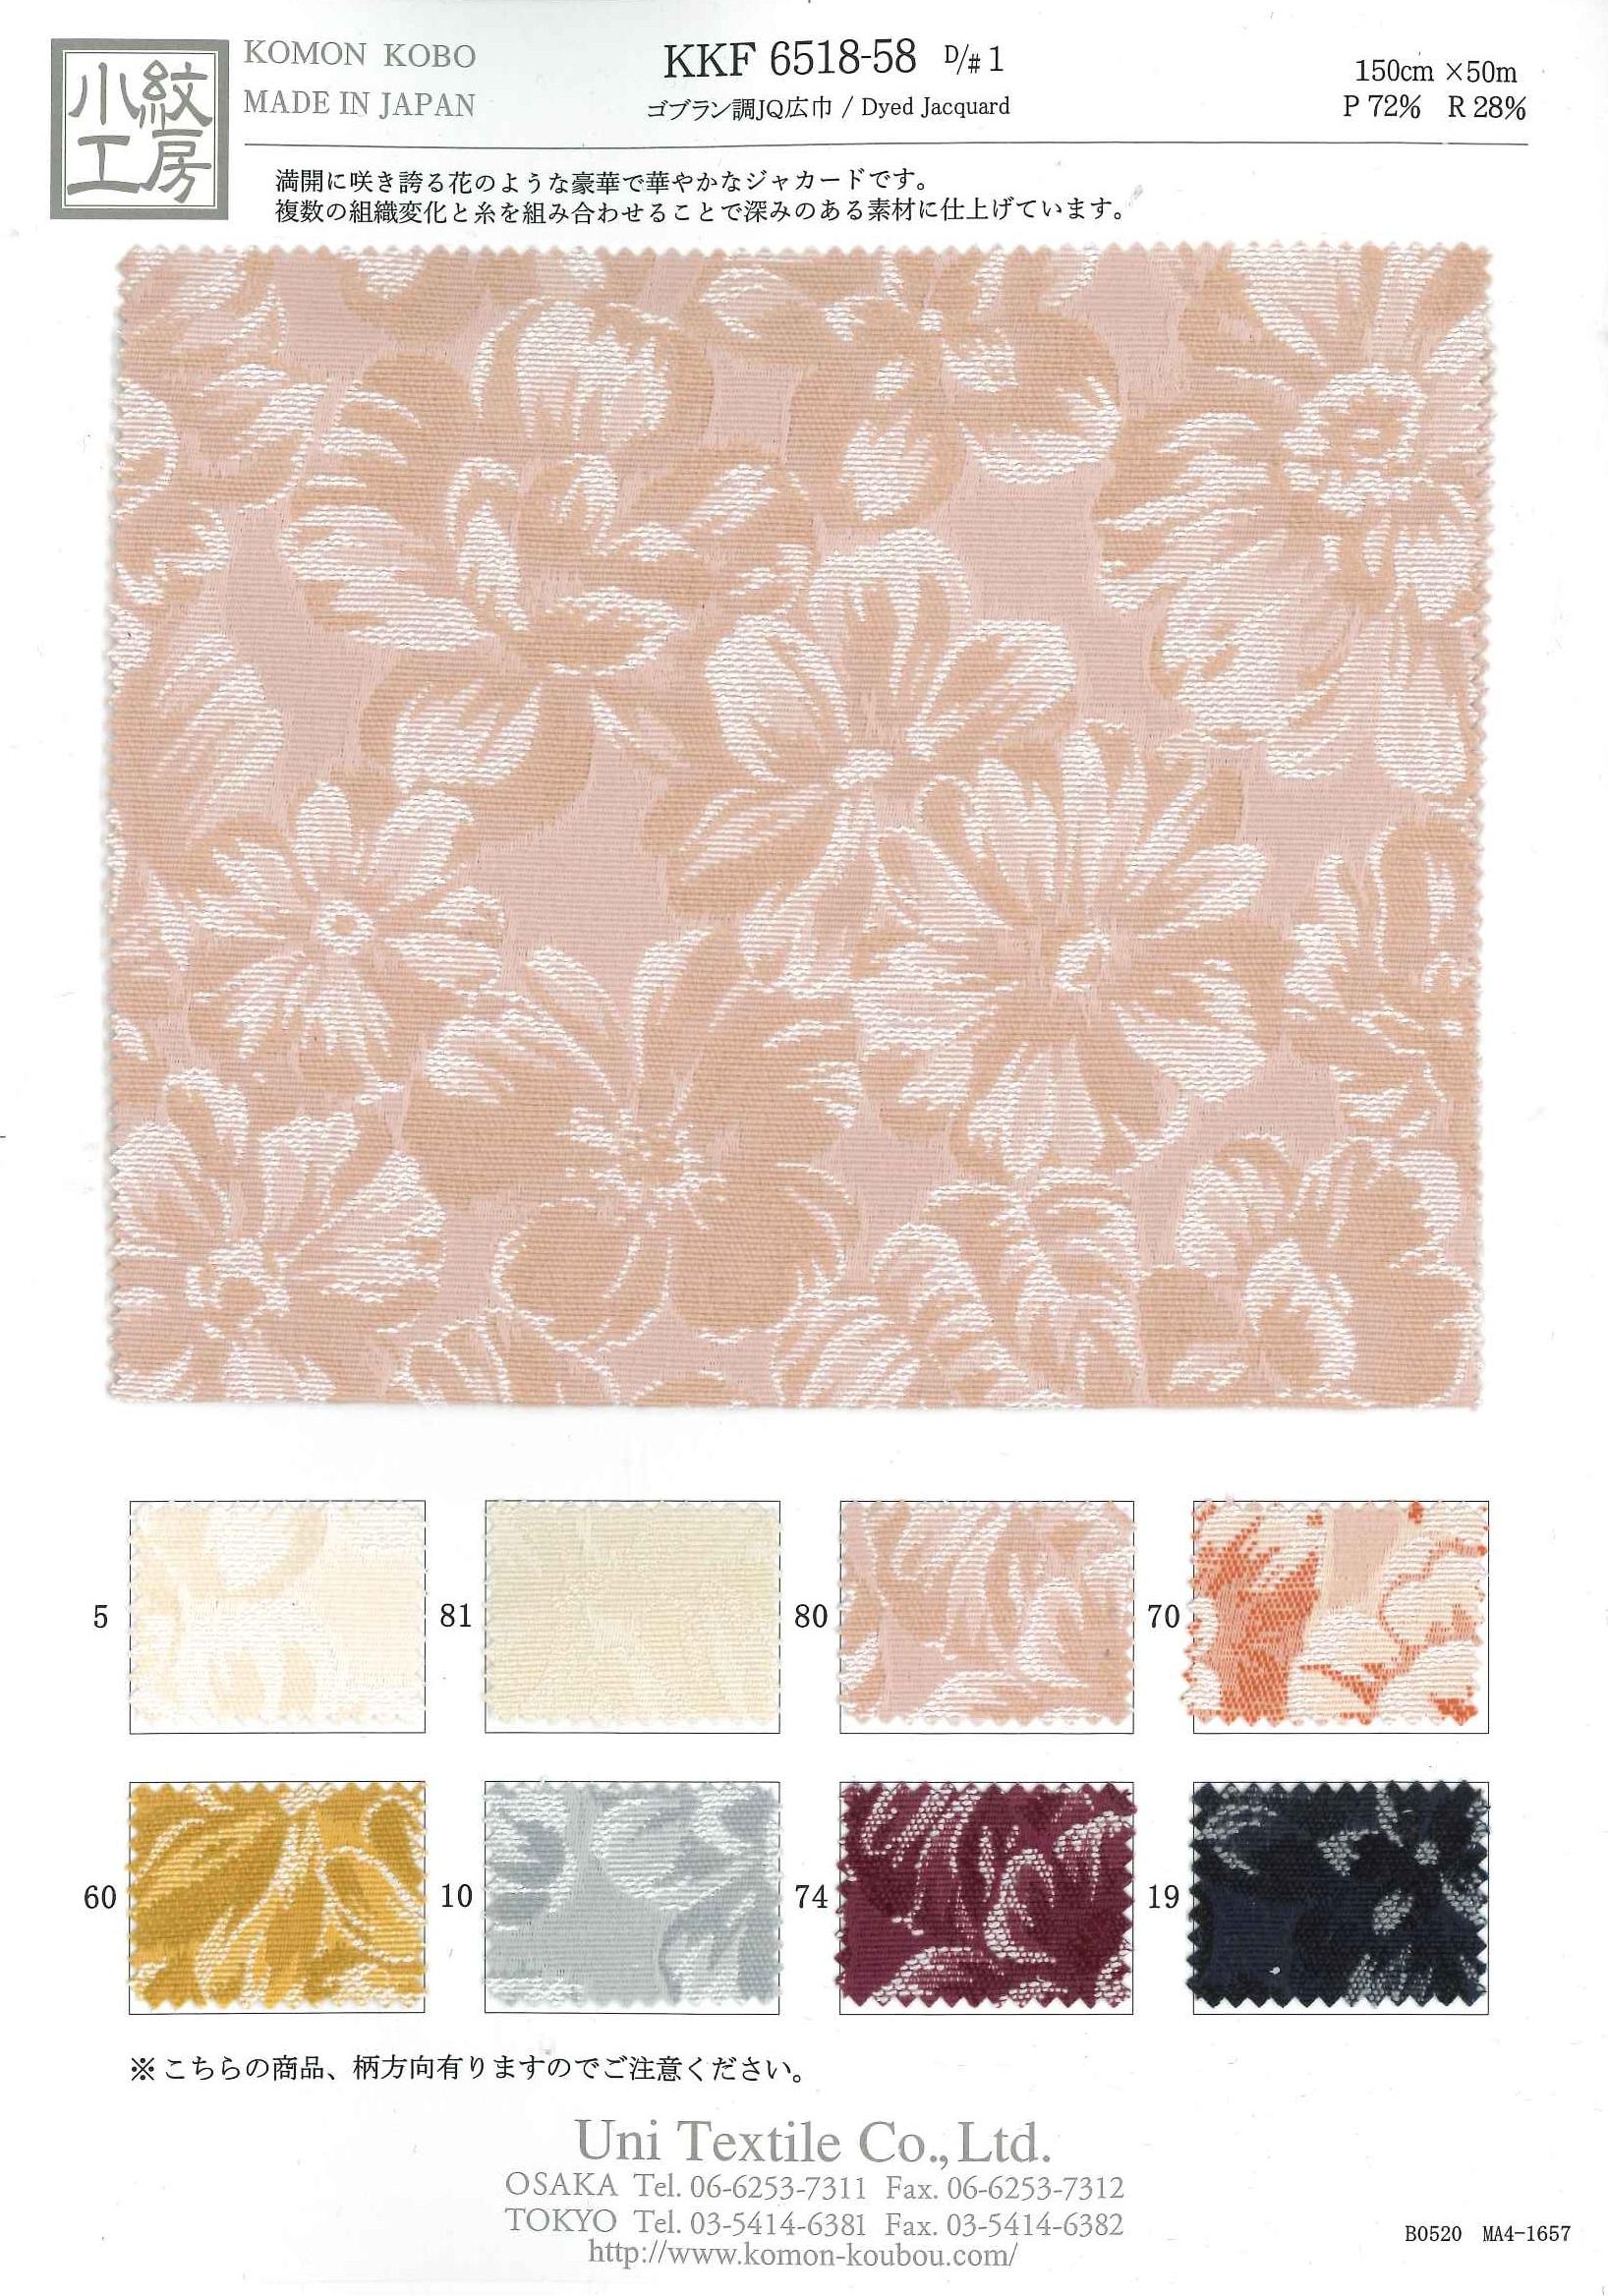 KKF6518-58 D/#1 ゴブラン調ジャカード広巾(花柄)